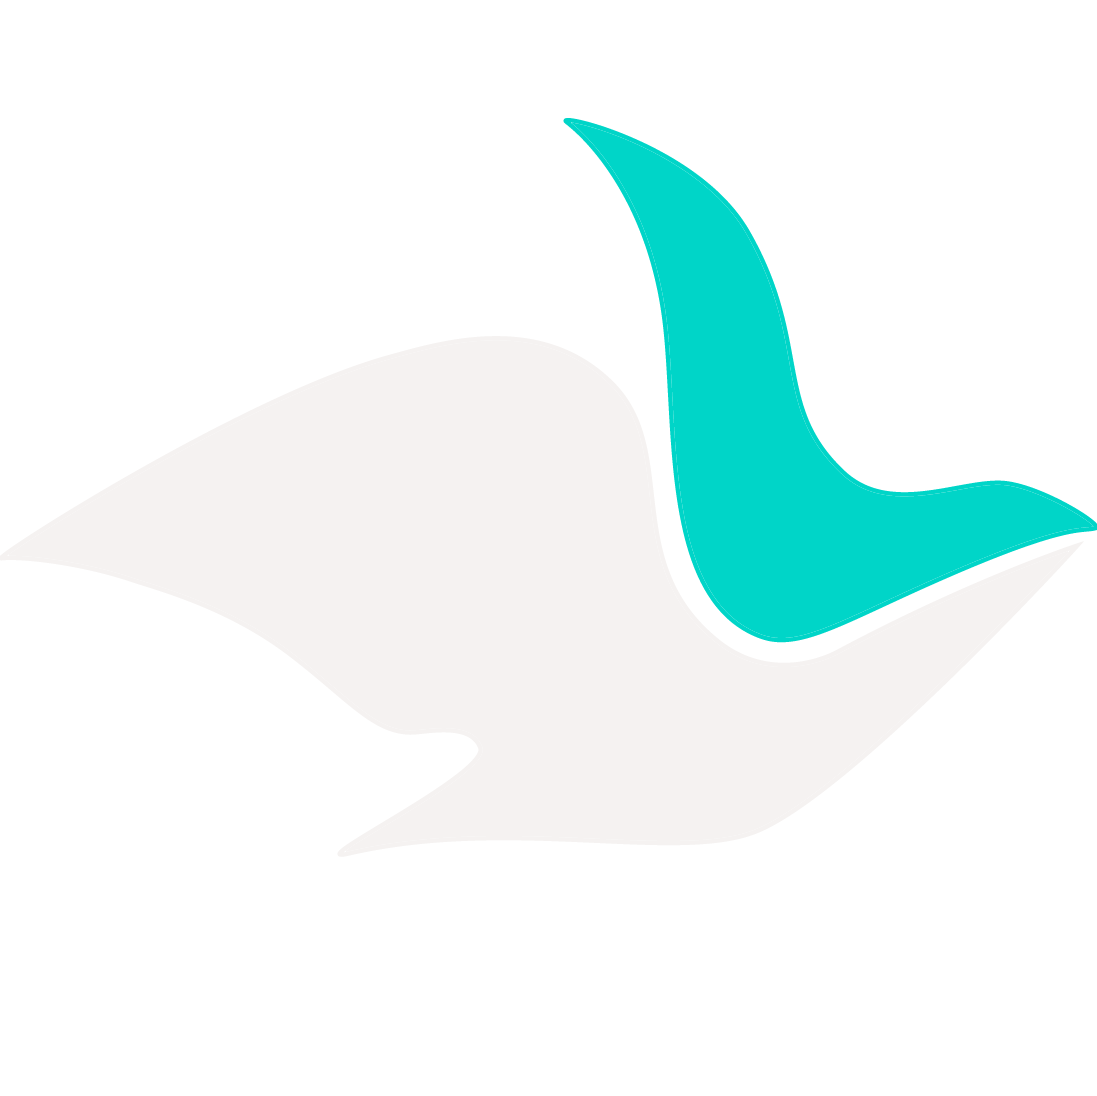 Peace clipart overpopulation Syndicate Hoax Creators Logo E